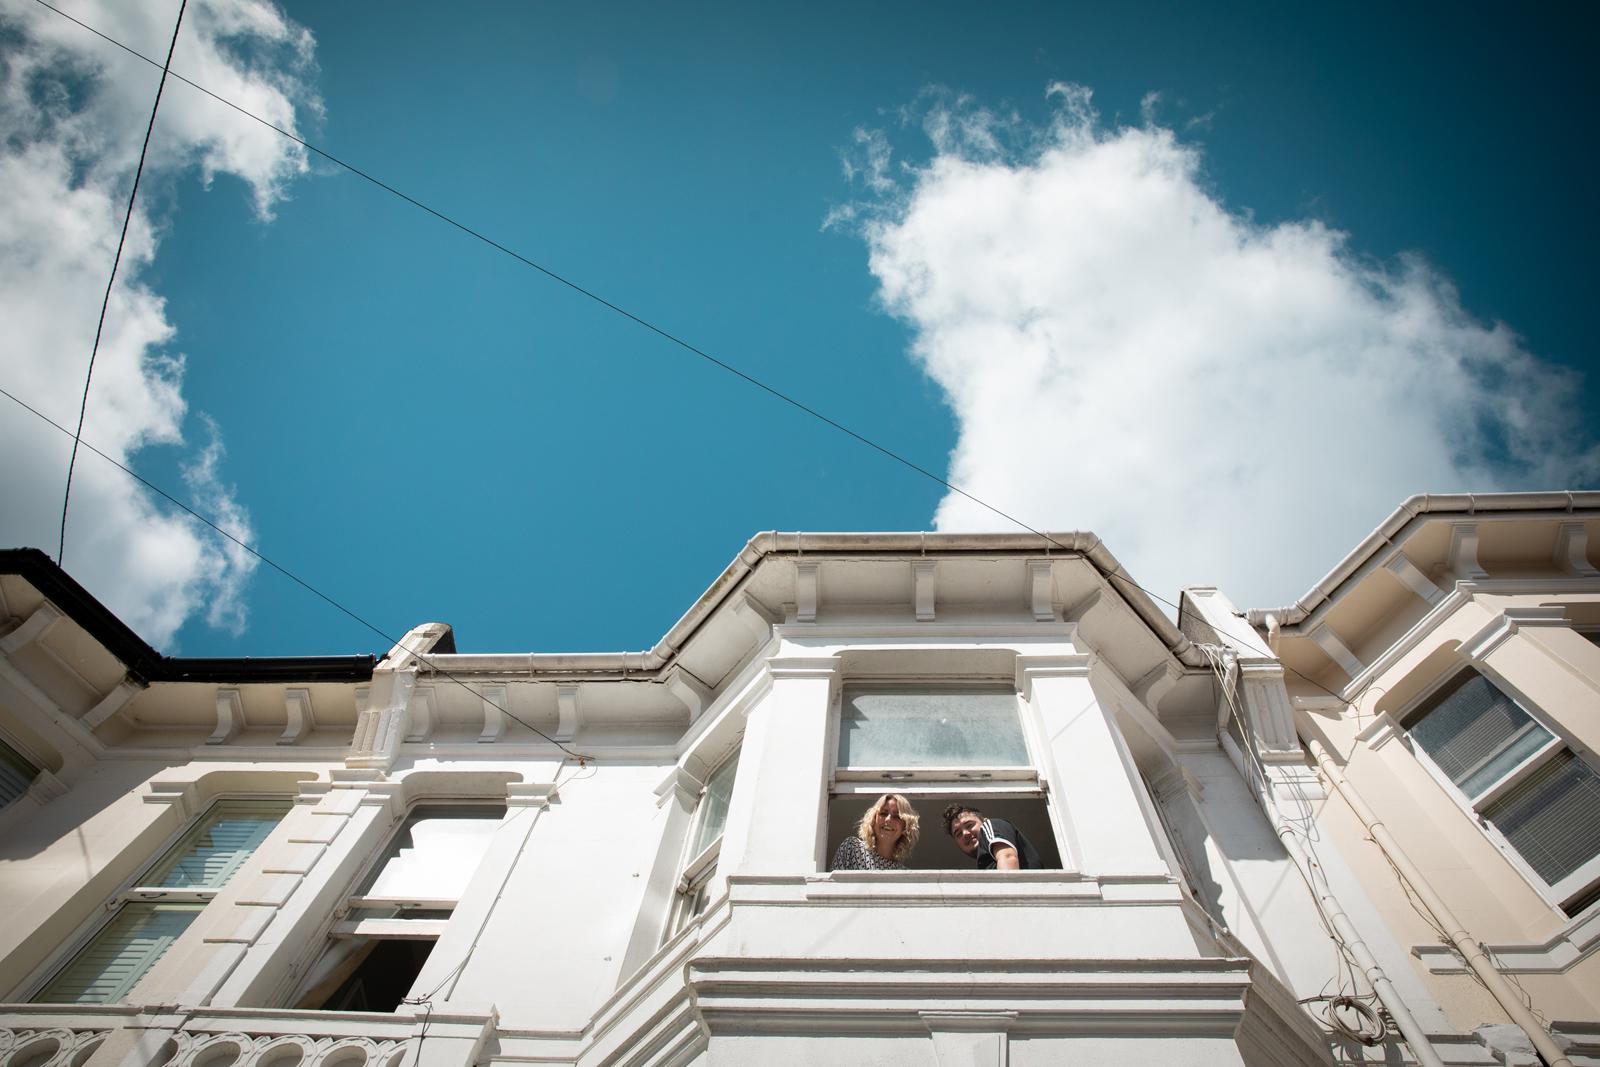 SHAUNA & CHRIS, CTMW, Photo by Gili Dailes